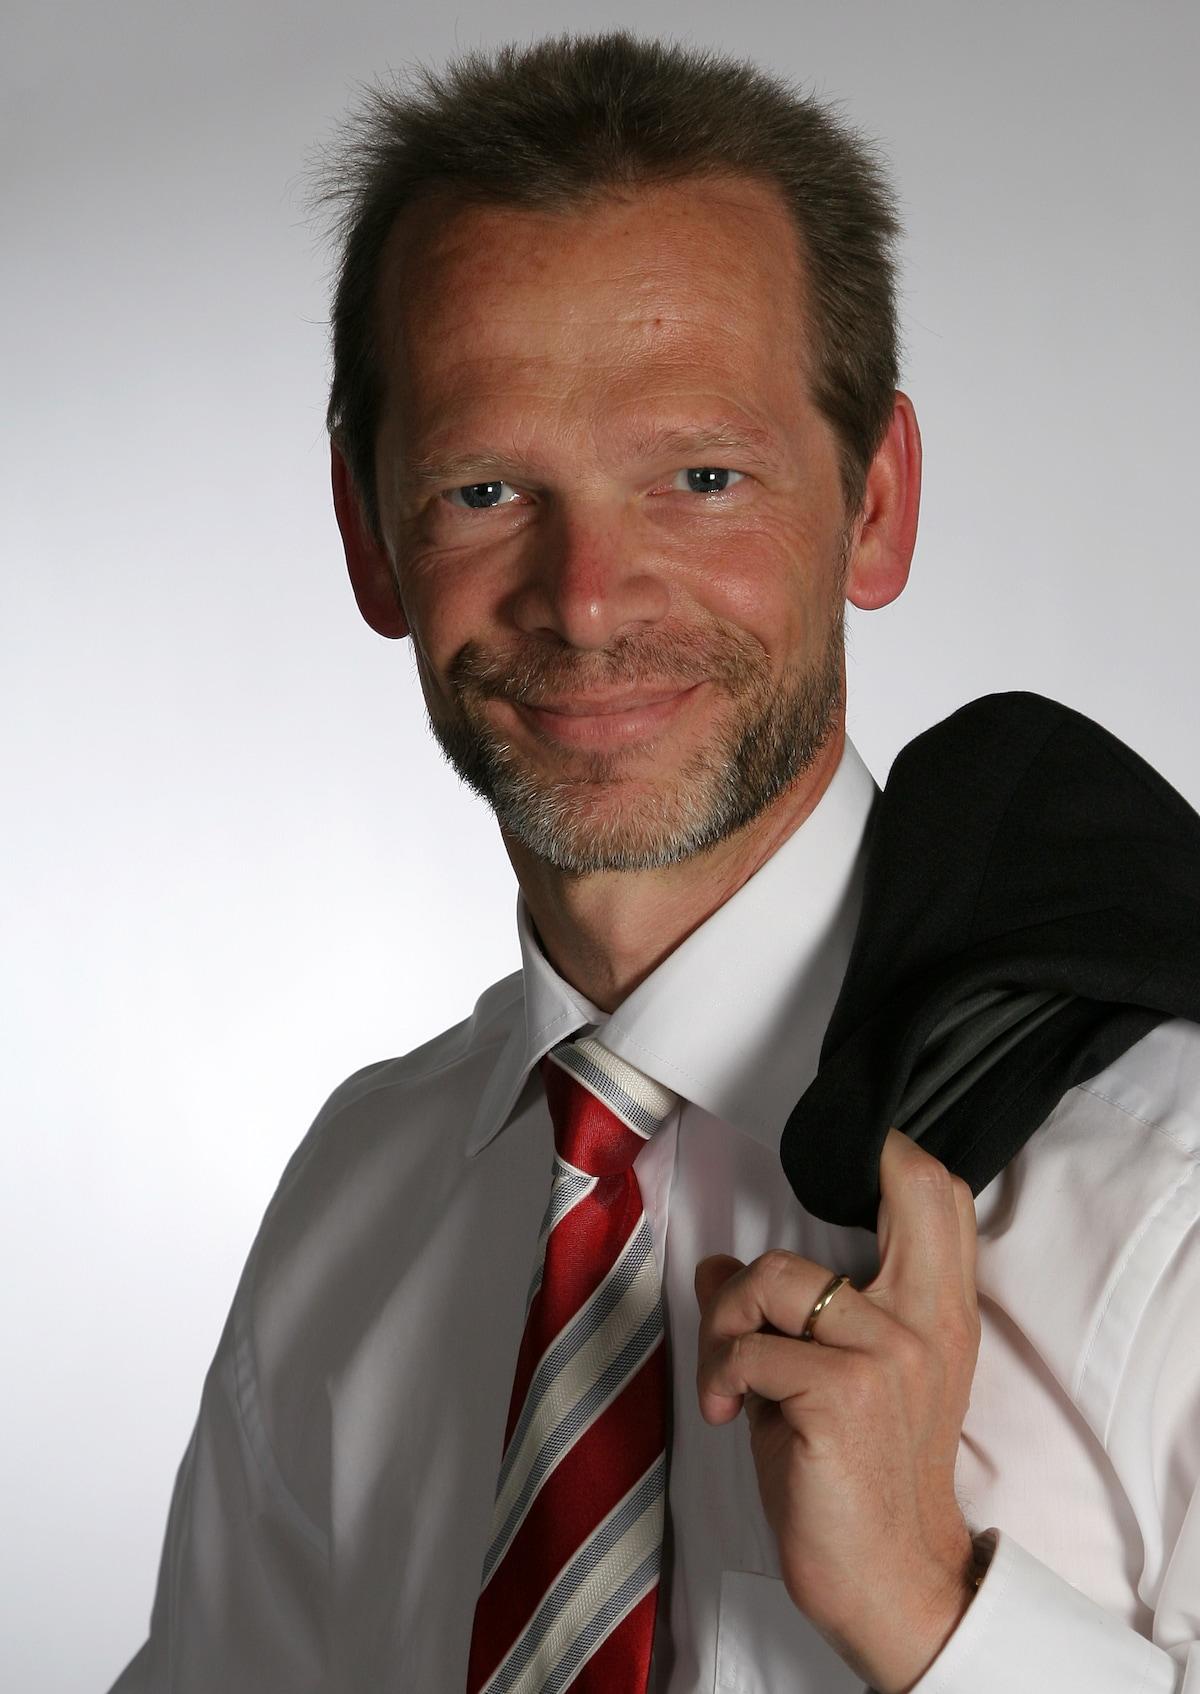 Helmut from Mönchengladbach